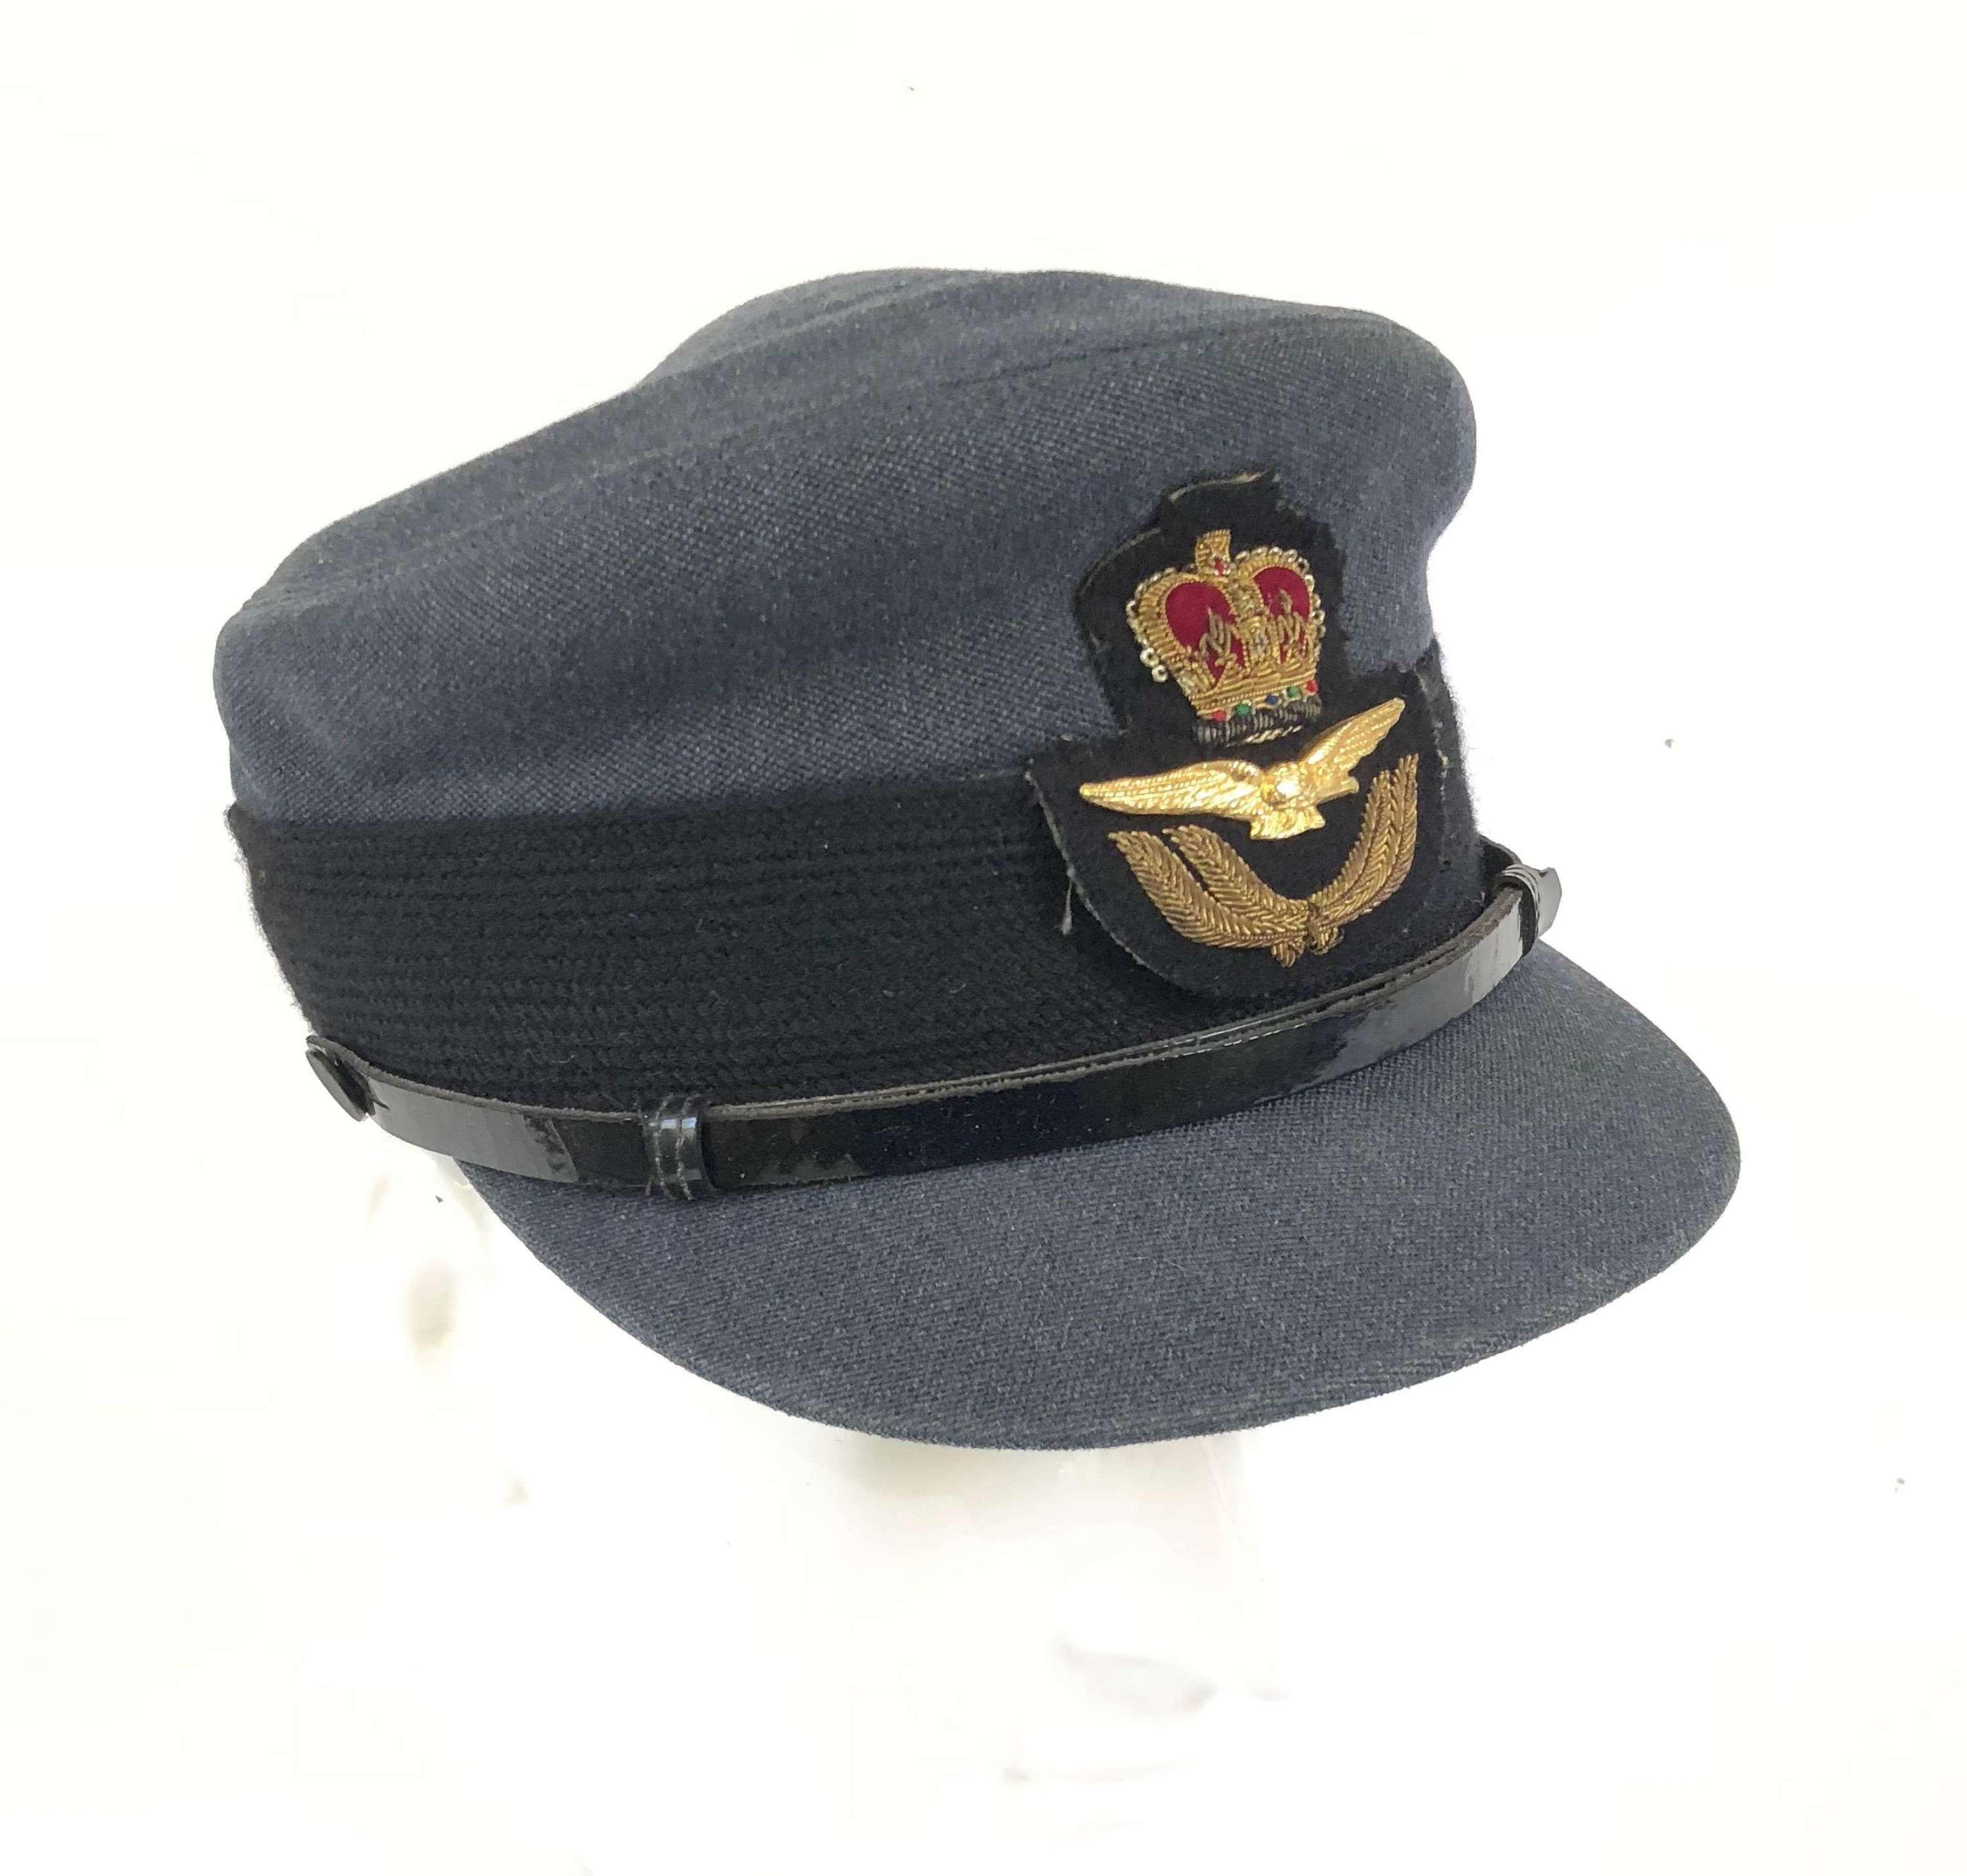 Women's Royal Air Force 1954 Pattern Officer's Cap.